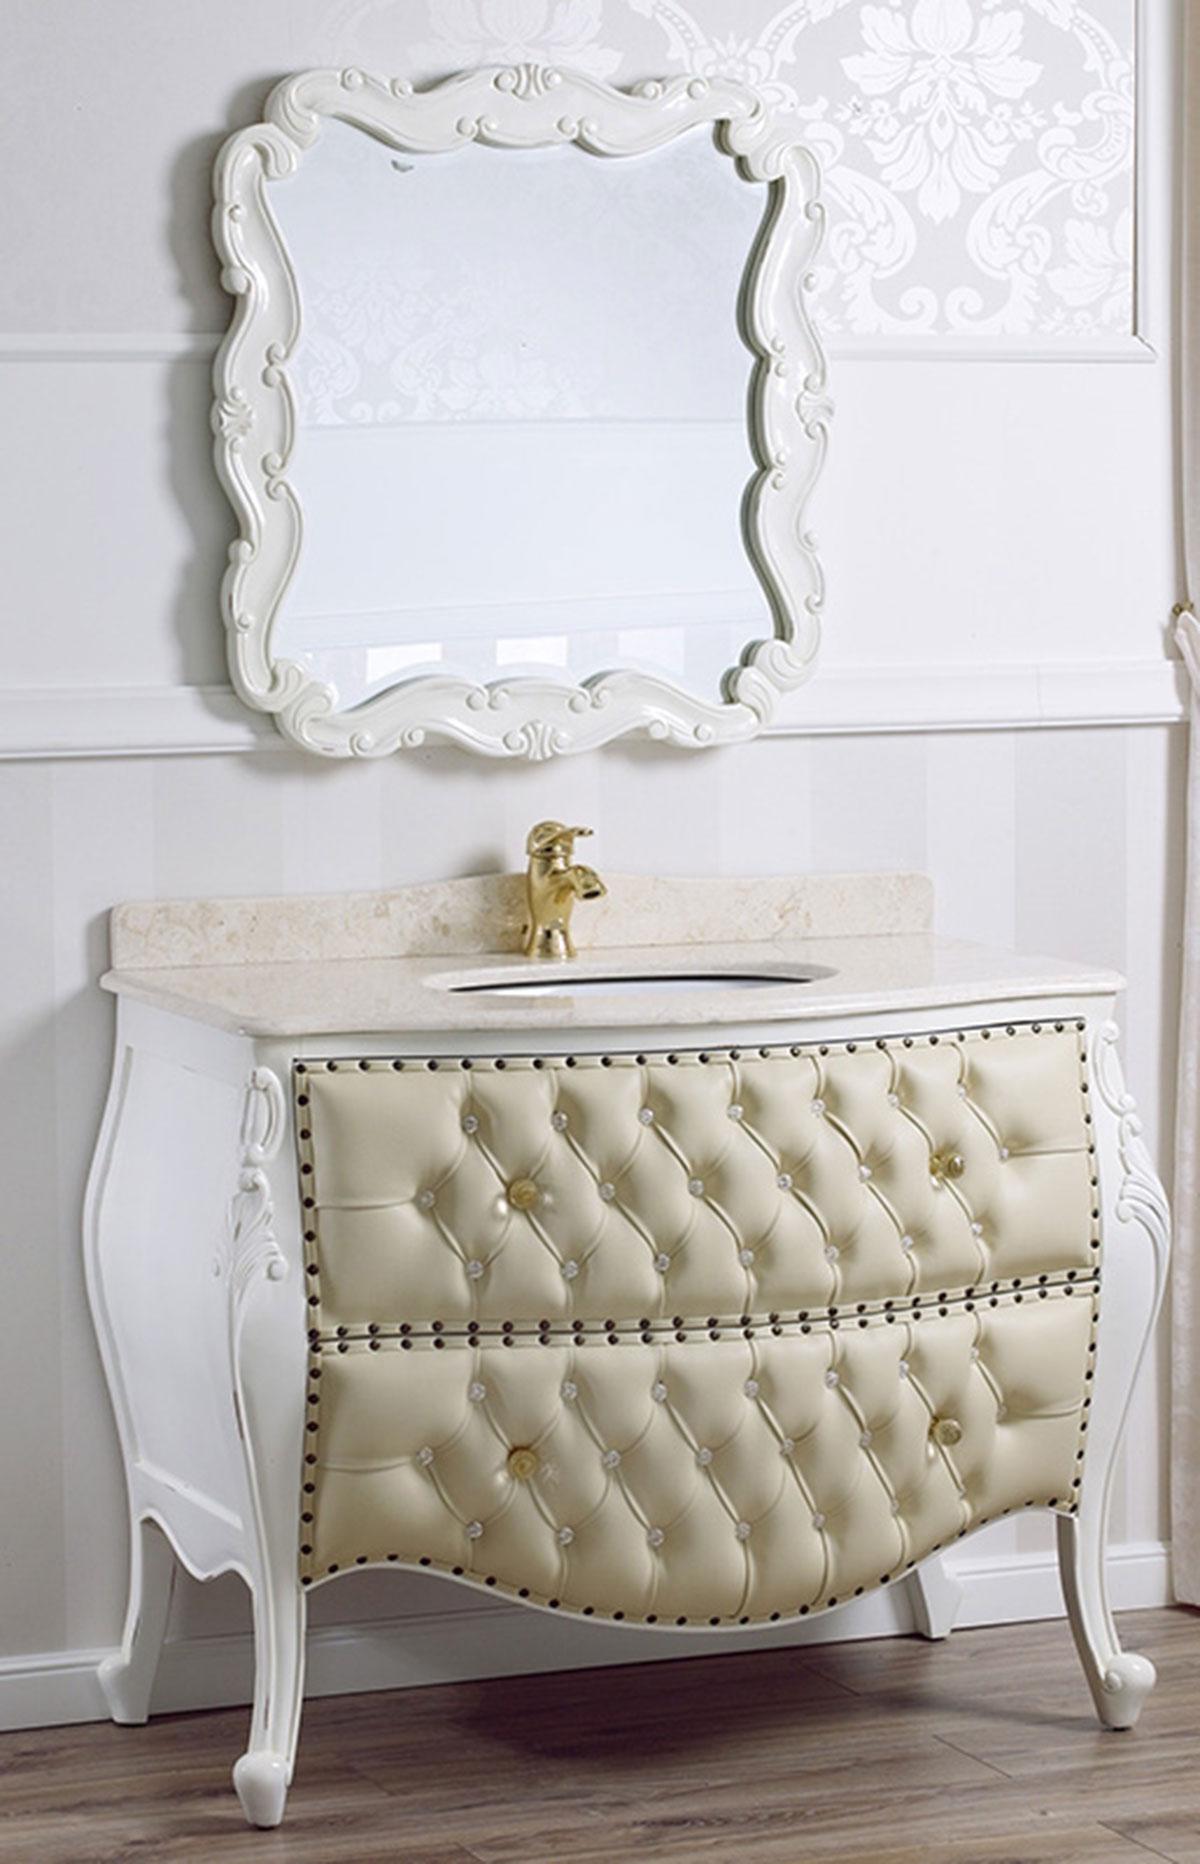 Como e specchio ramirez stile shabby chic arredo bagno bombato bianco anticato m ebay - Arredo bagno stile shabby ...